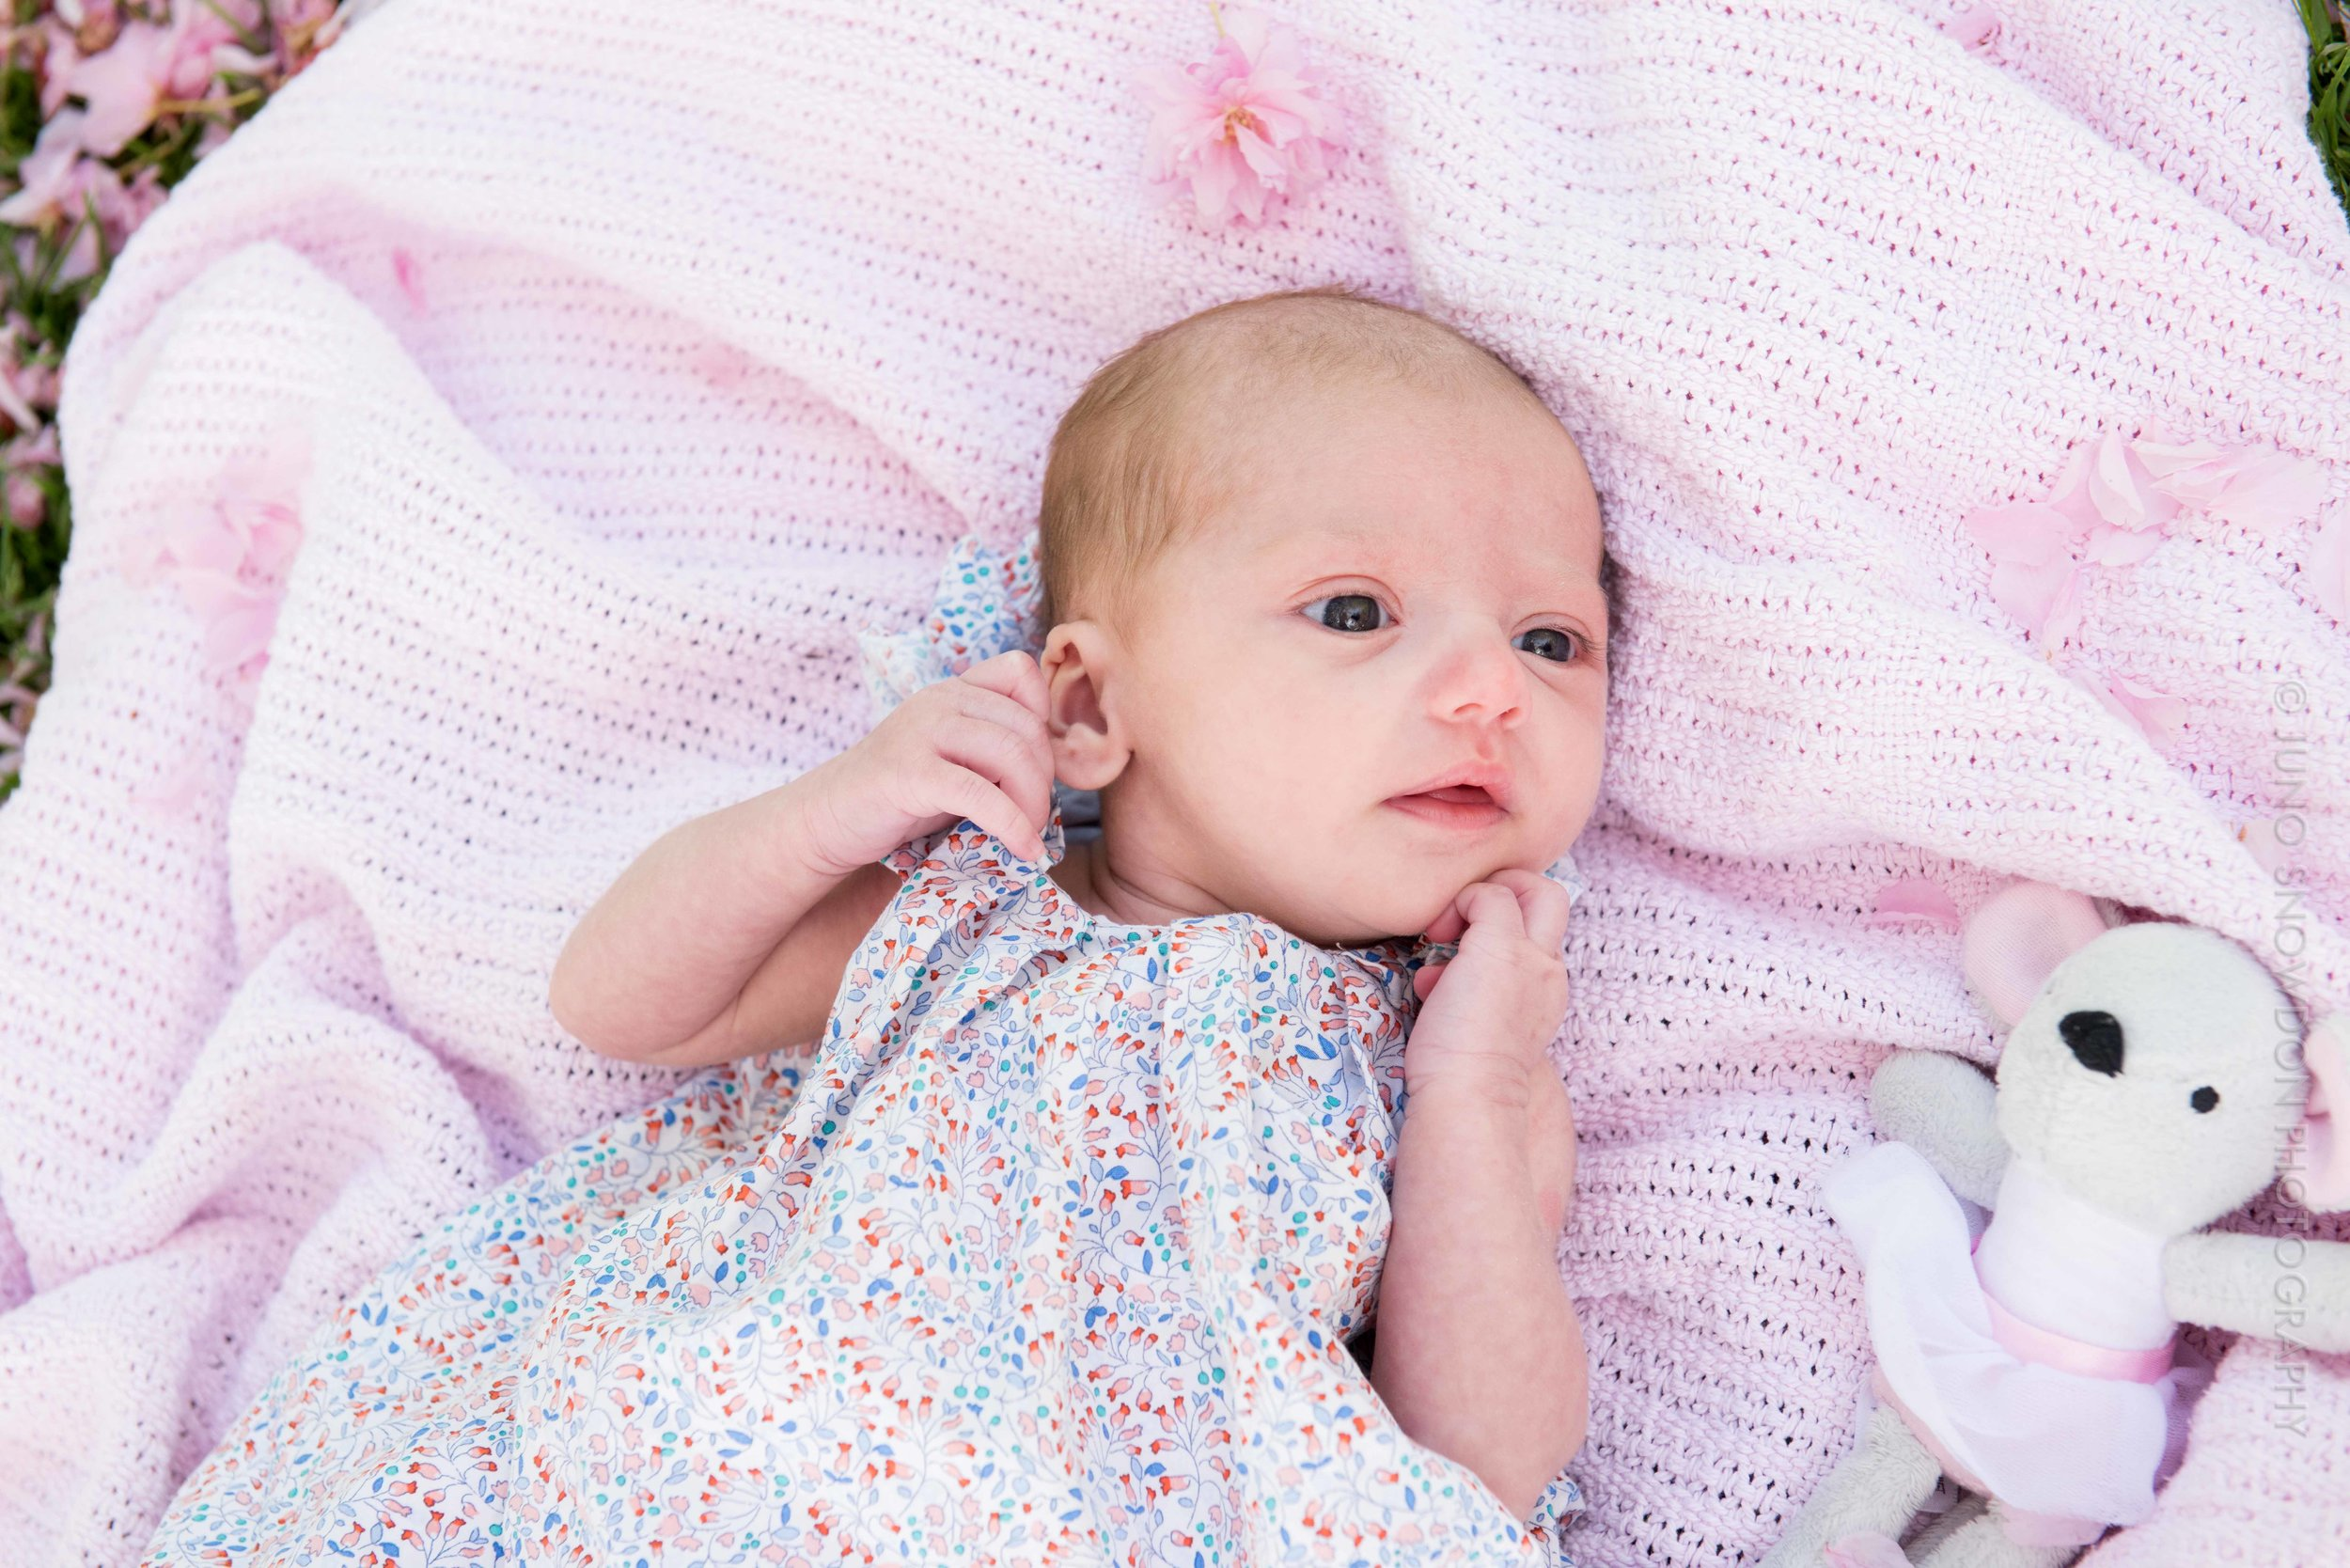 juno-snowdon-photography-newborn-6048.jpg